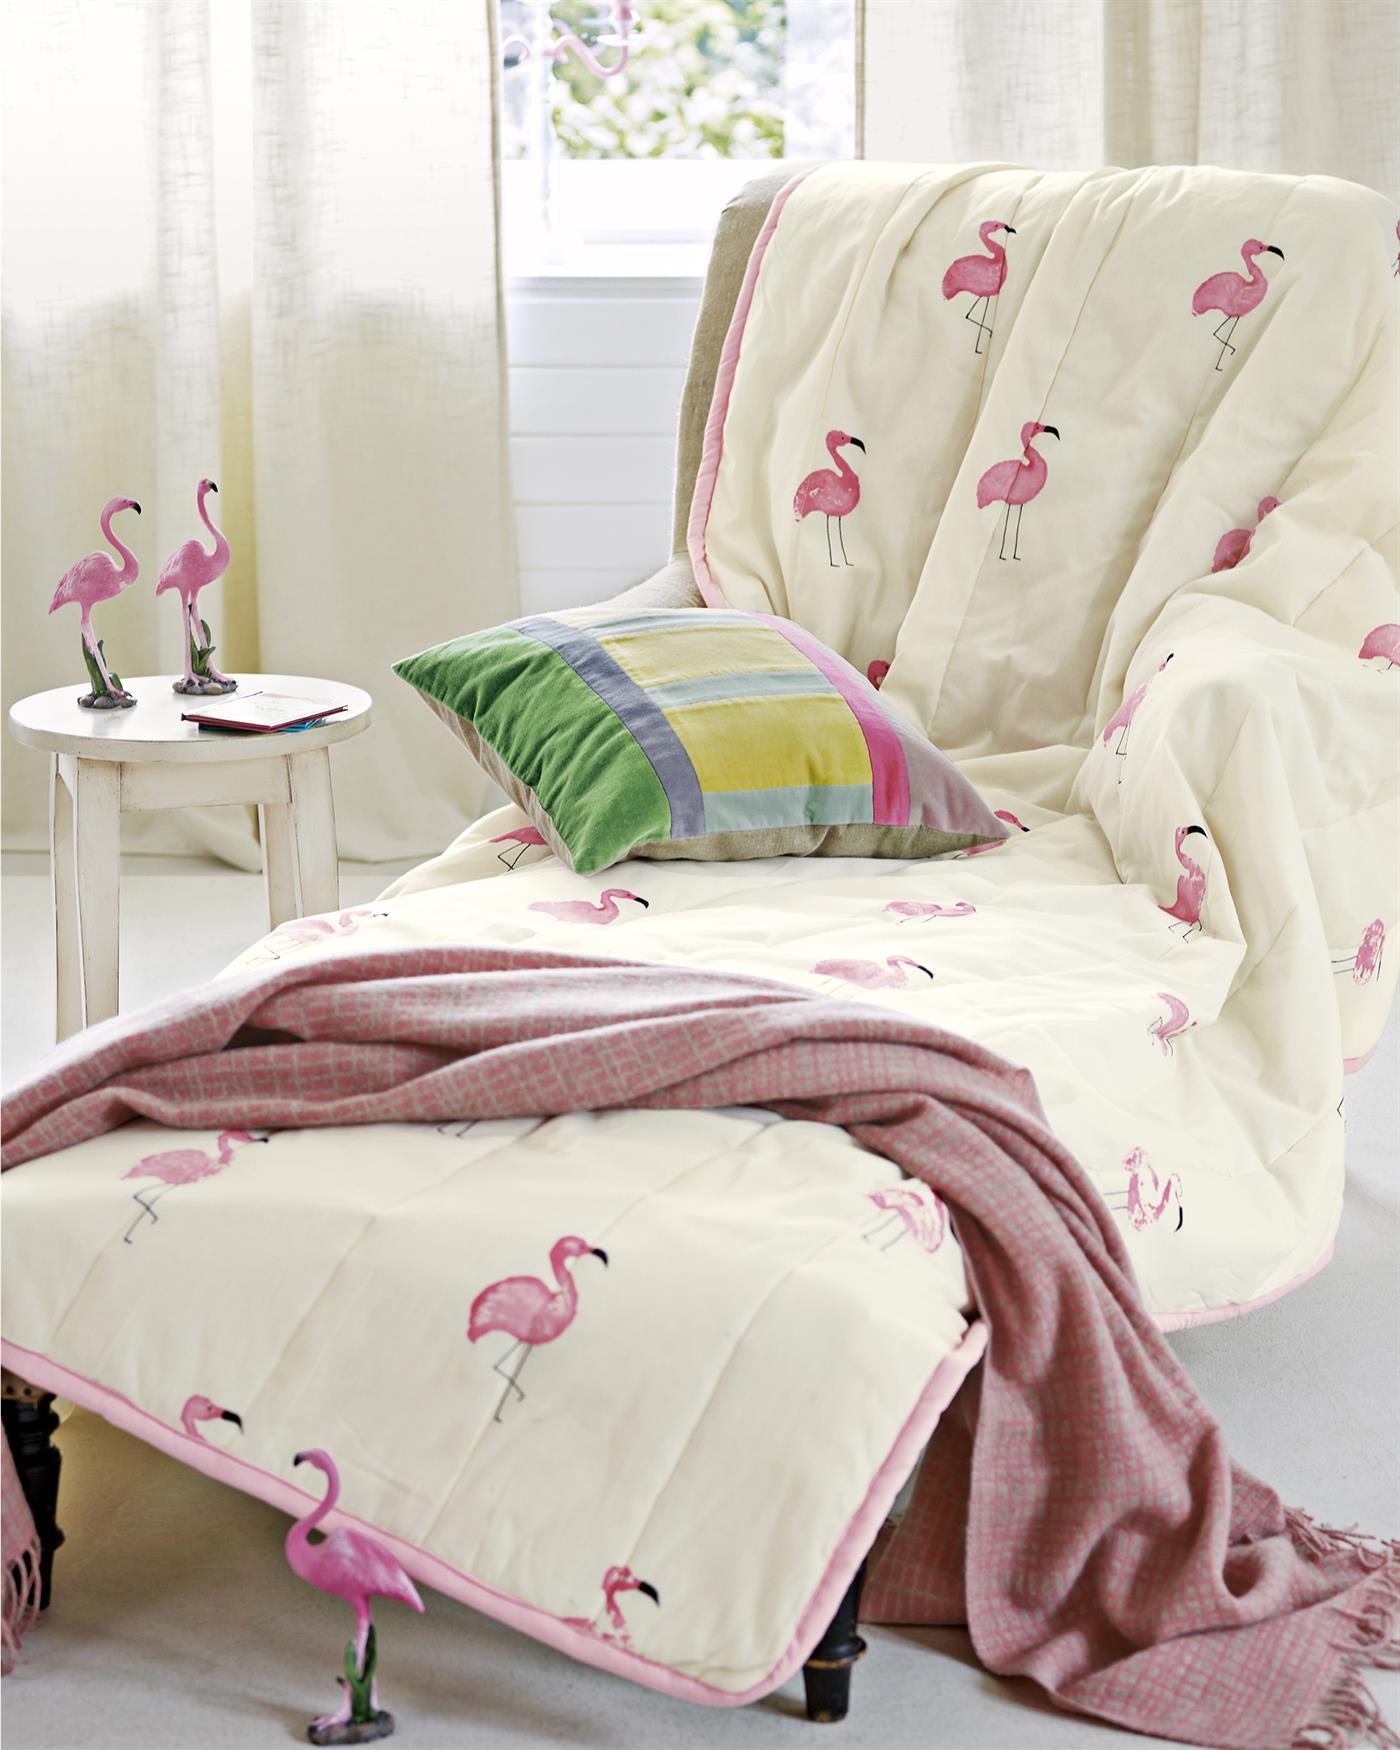 steppdecke flamingo. Black Bedroom Furniture Sets. Home Design Ideas